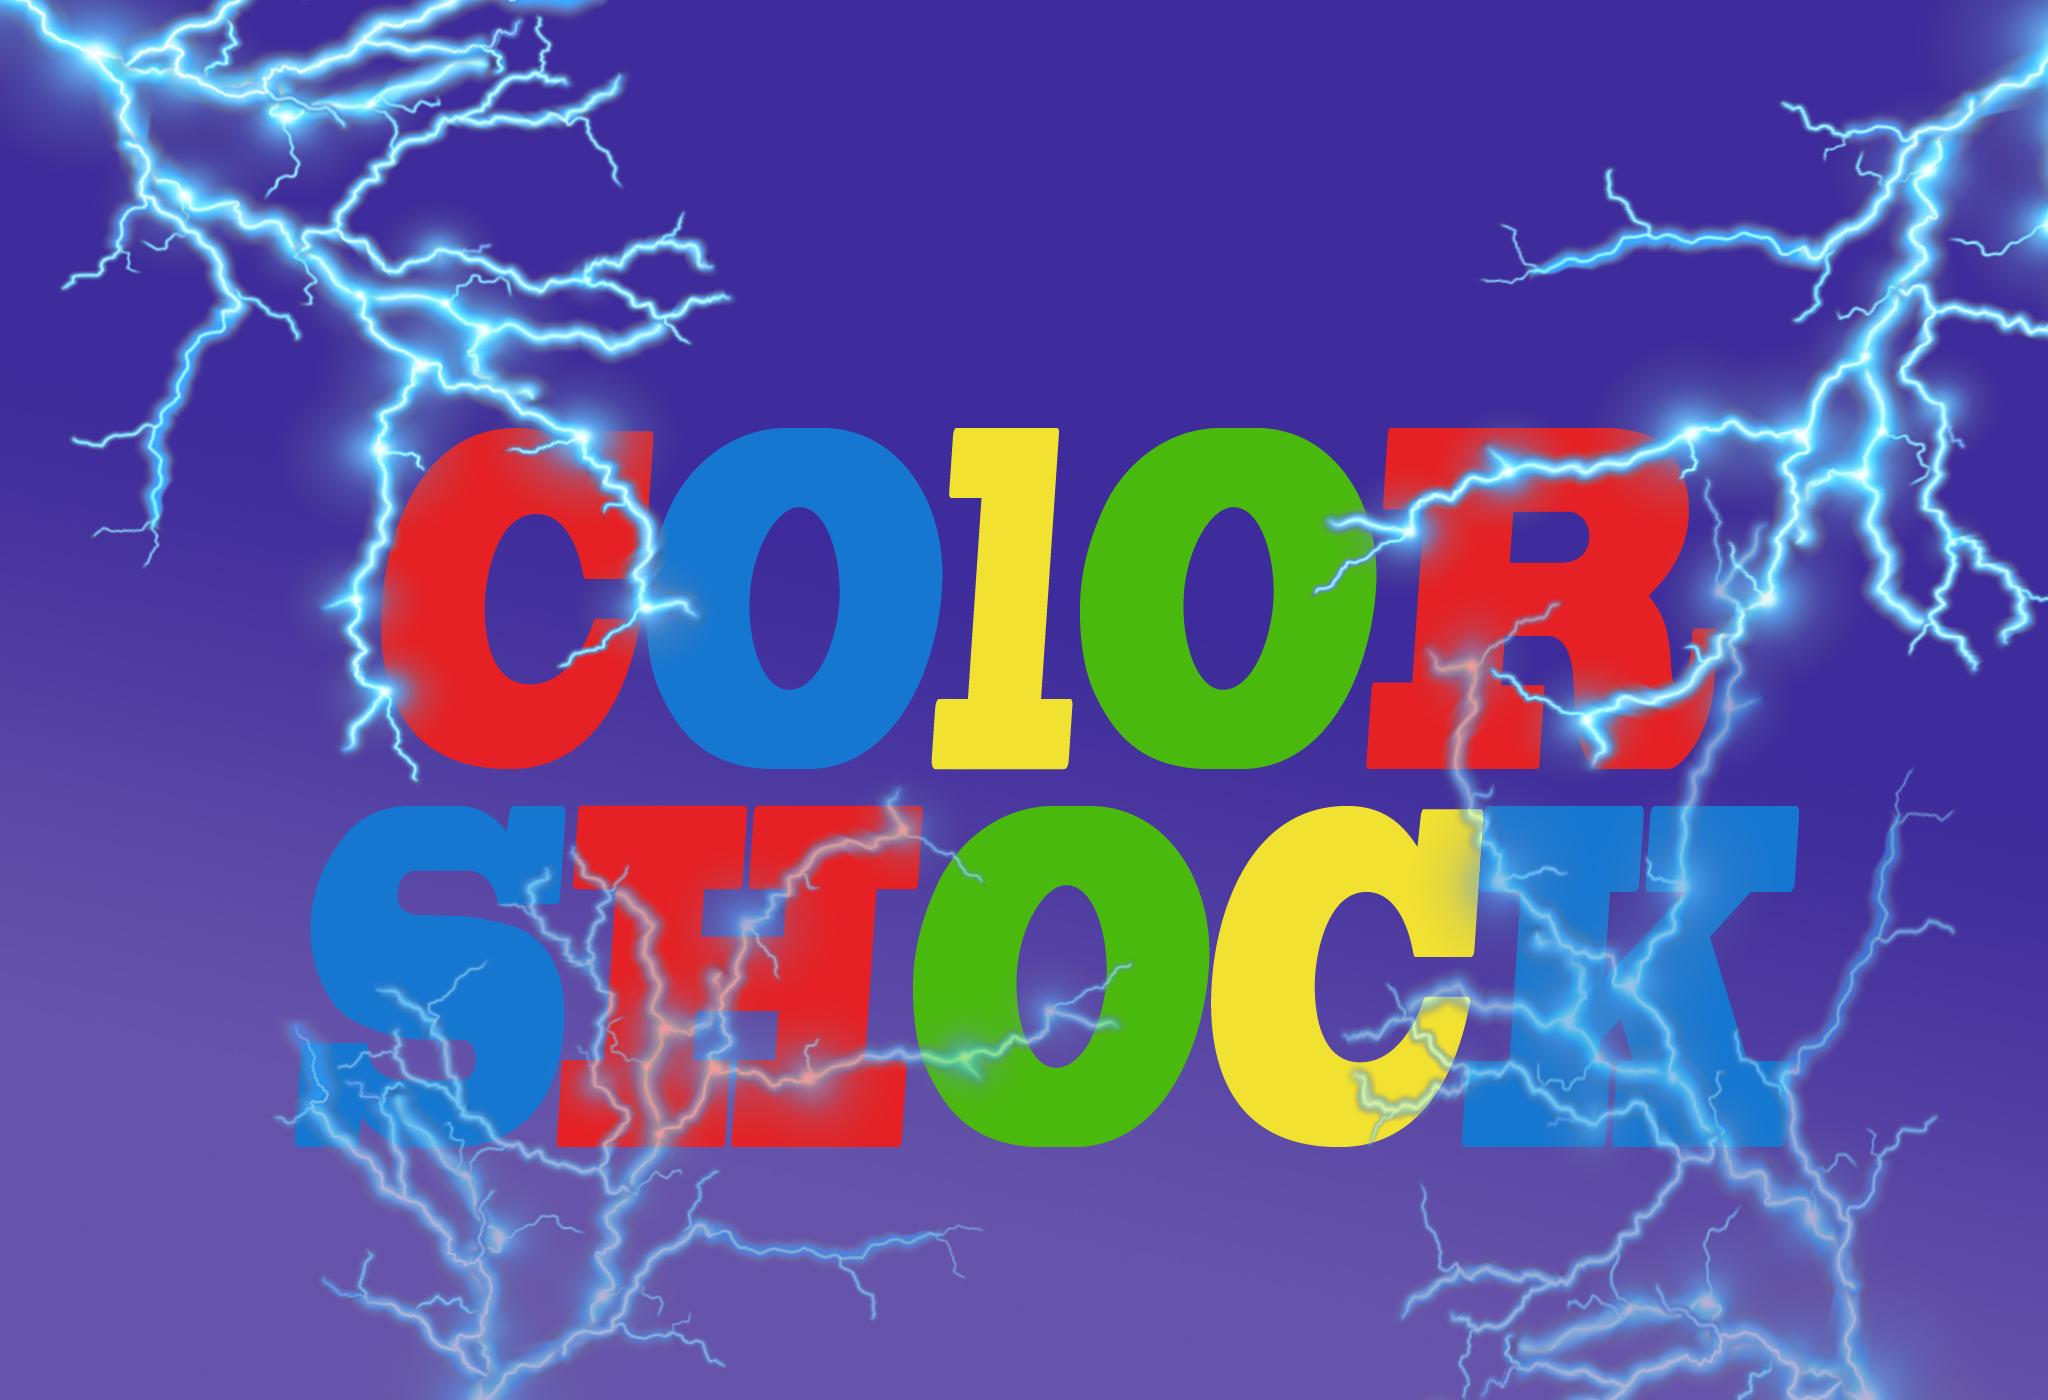 Color Shock